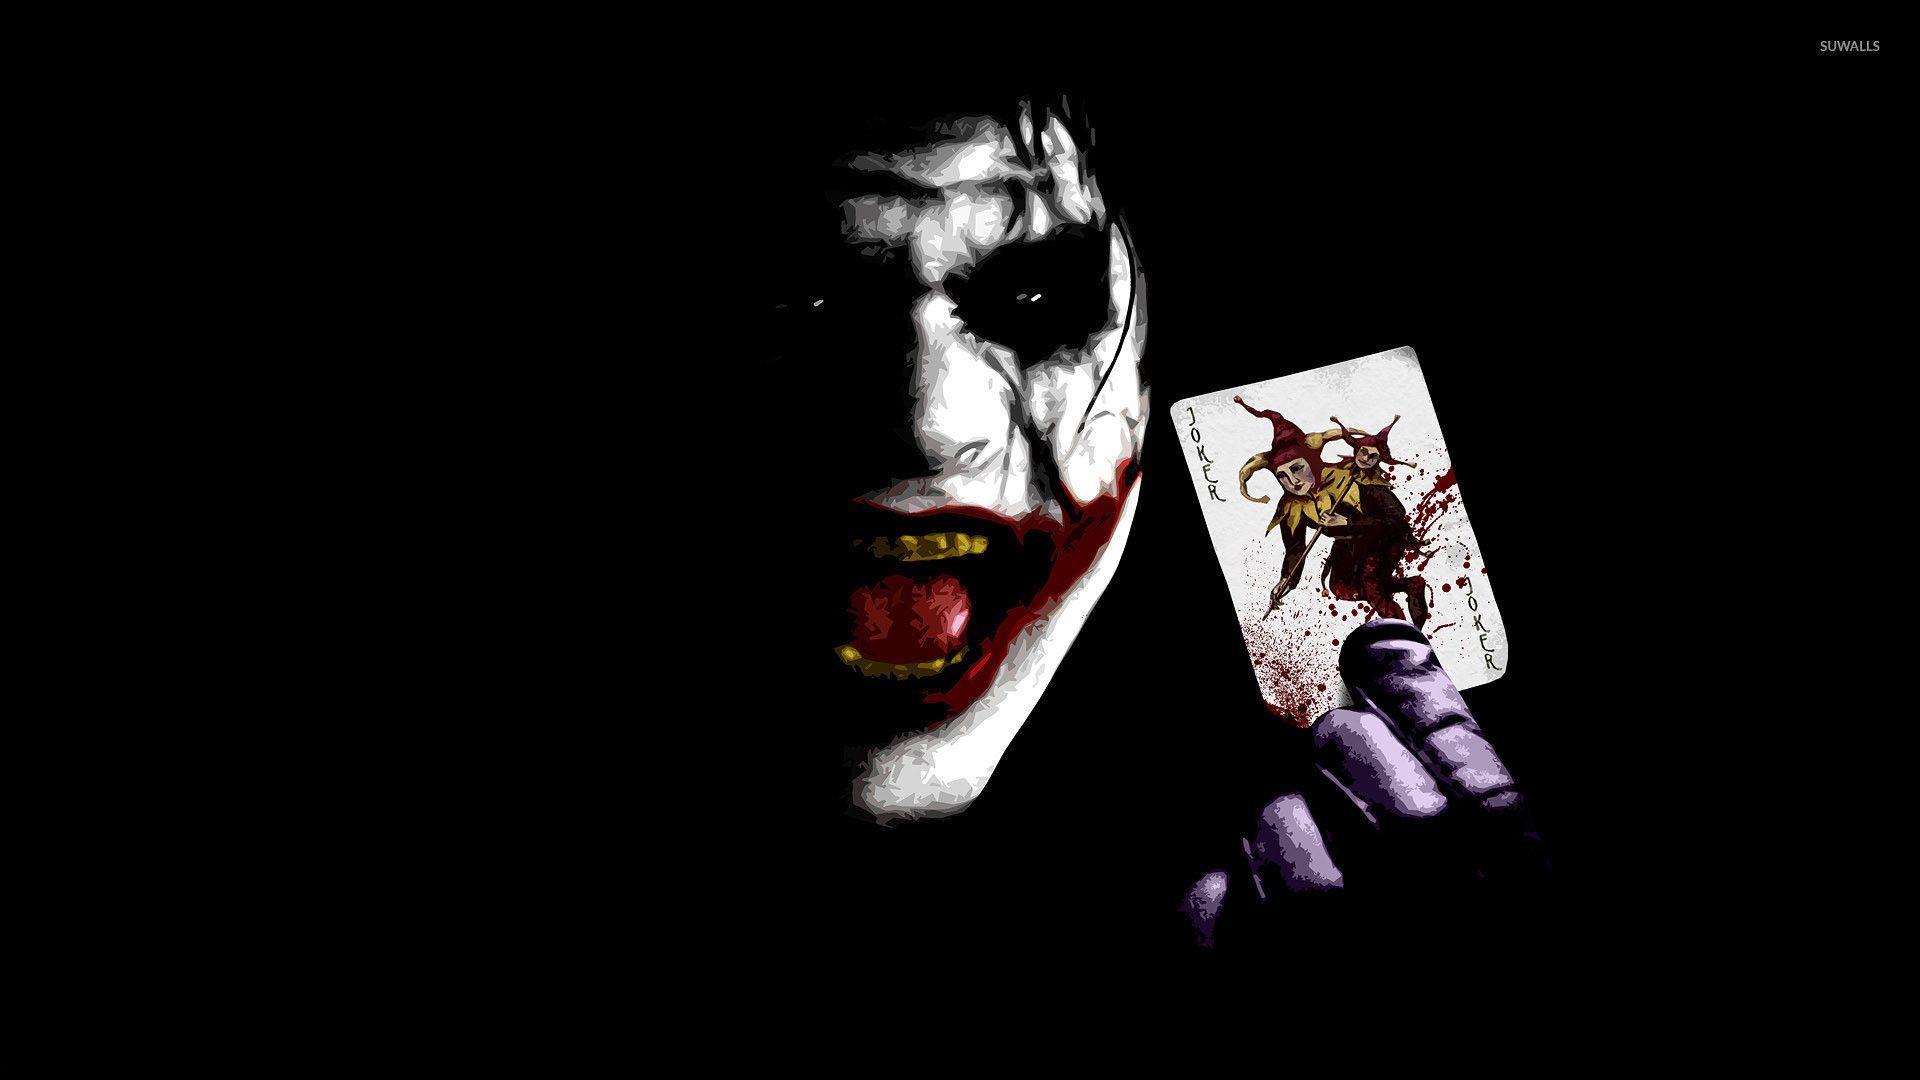 Res 1920x1080 The Joker Holding A Card The Dark Knight Wallpaper Joker Wallpaper Joker Wallpapers Joker Wallpaper Hd